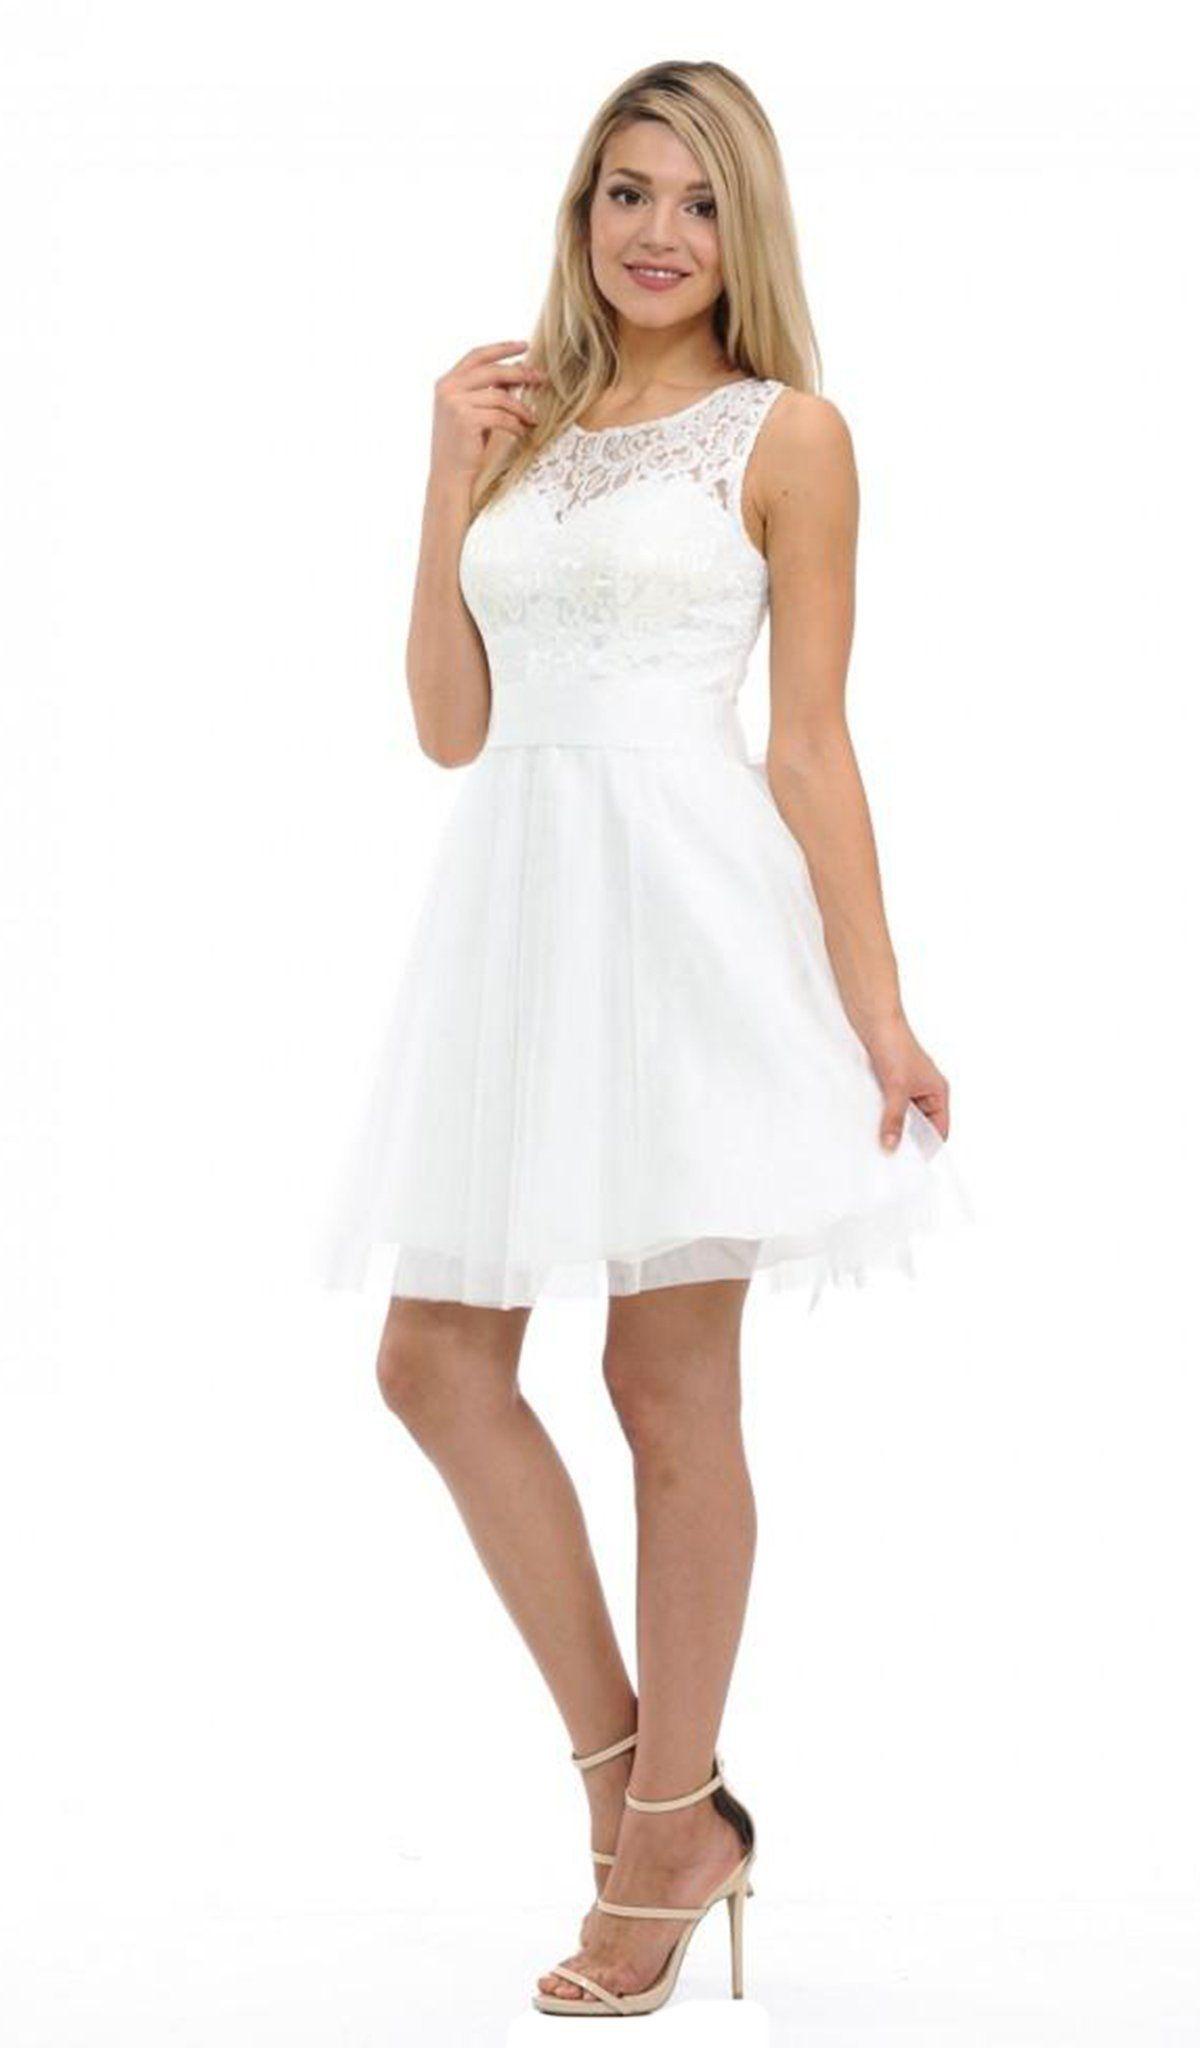 Lenovia 8120 Illusion Jewel Ballerina Cocktail Dress White Lace Cocktail Dress Cocktail Dress Lace Dresses [ 2048 x 1200 Pixel ]